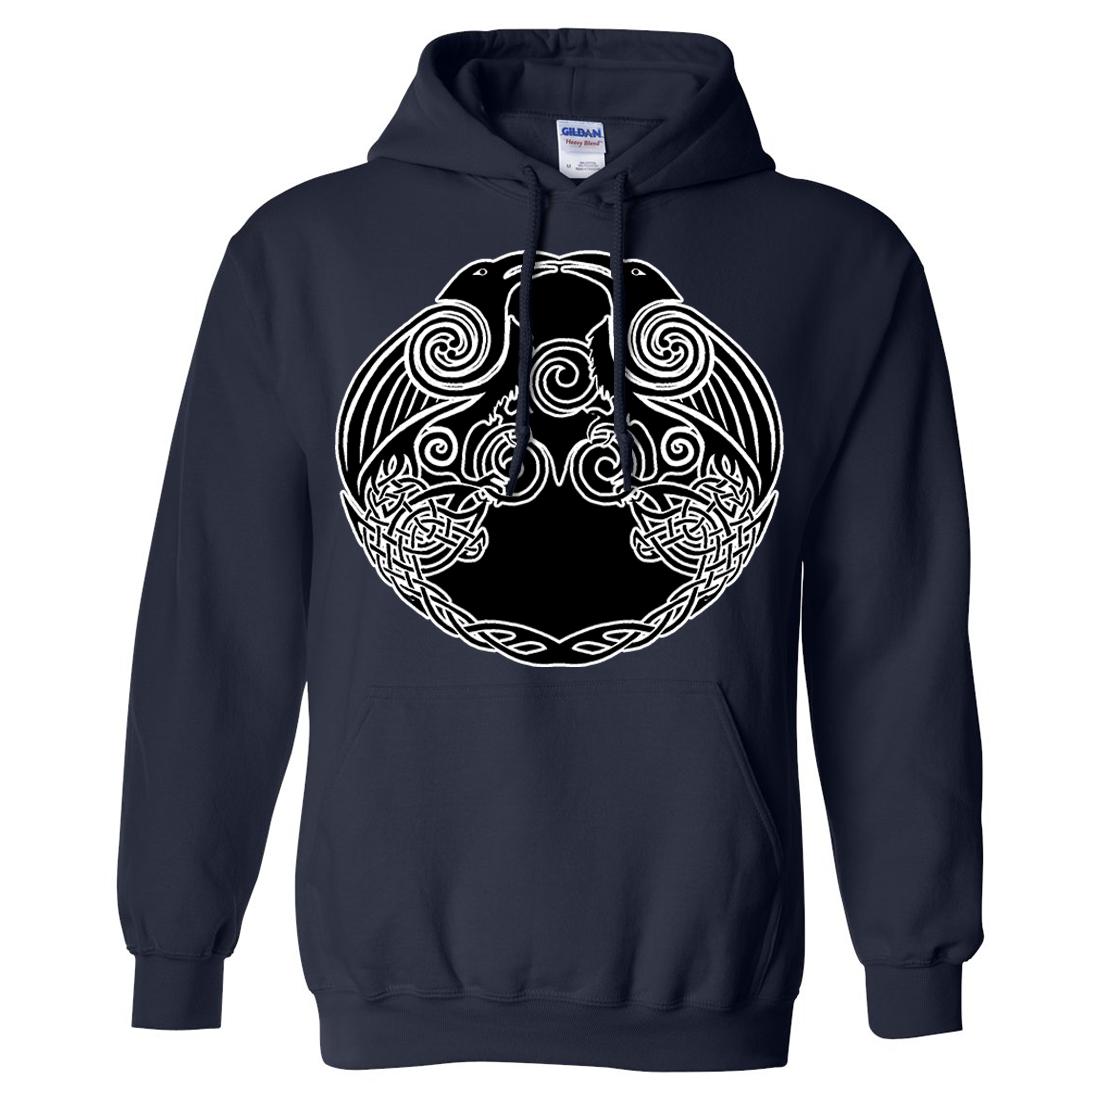 Dual Raven Two Tone Sweatshirt Hoodie